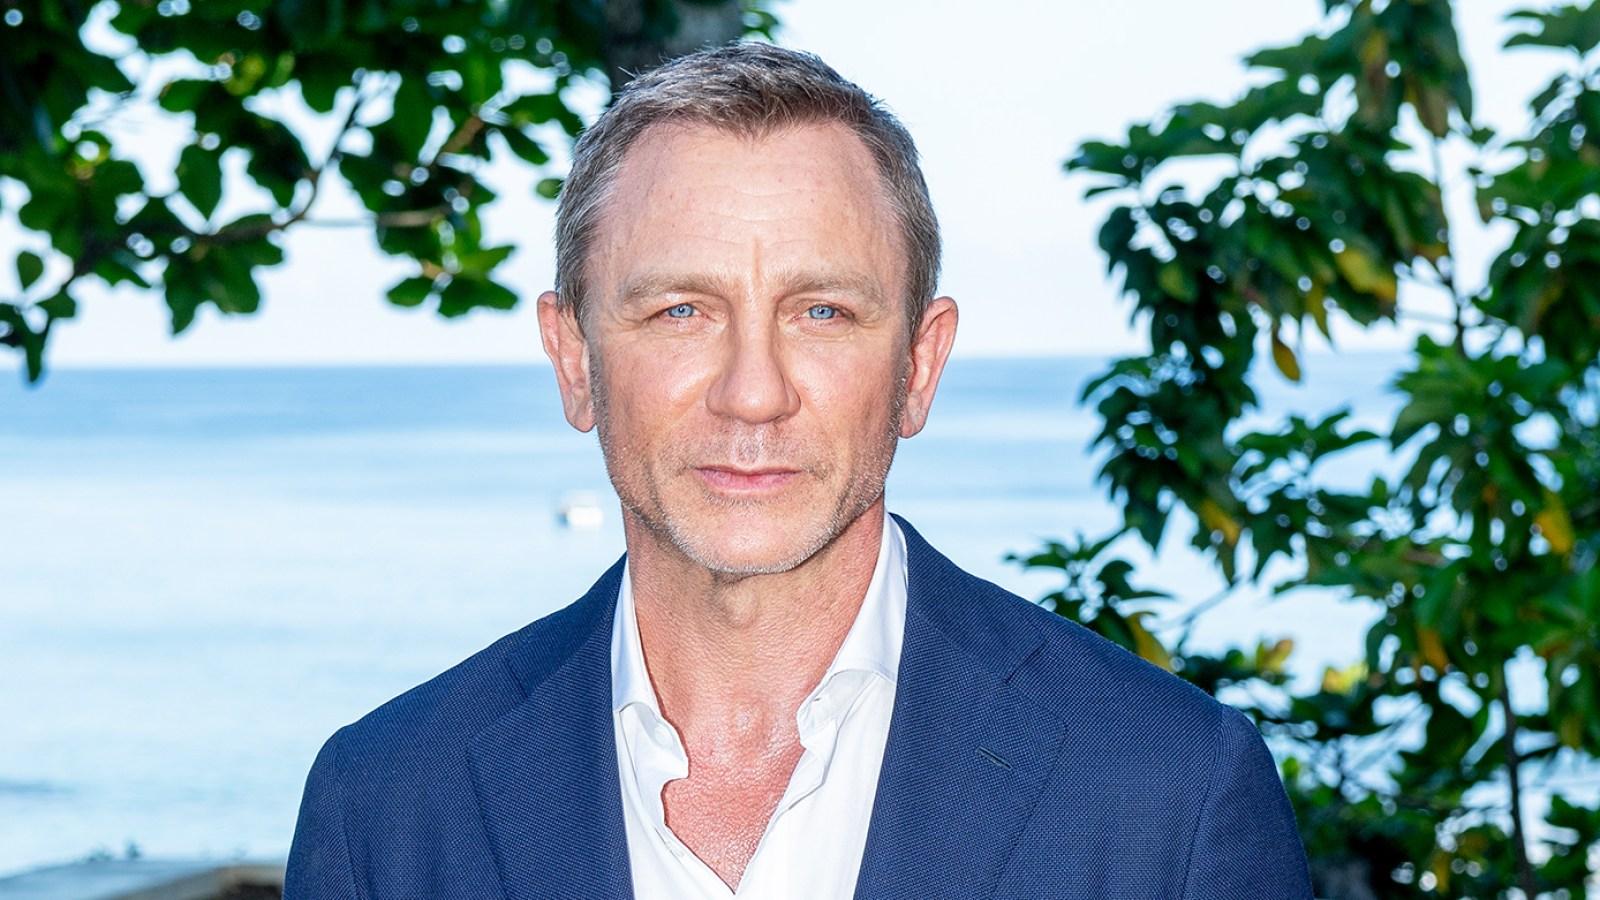 9b34b47271 Daniel Craig Injured on 'Bond 25' Set, Filming Suspended: Report